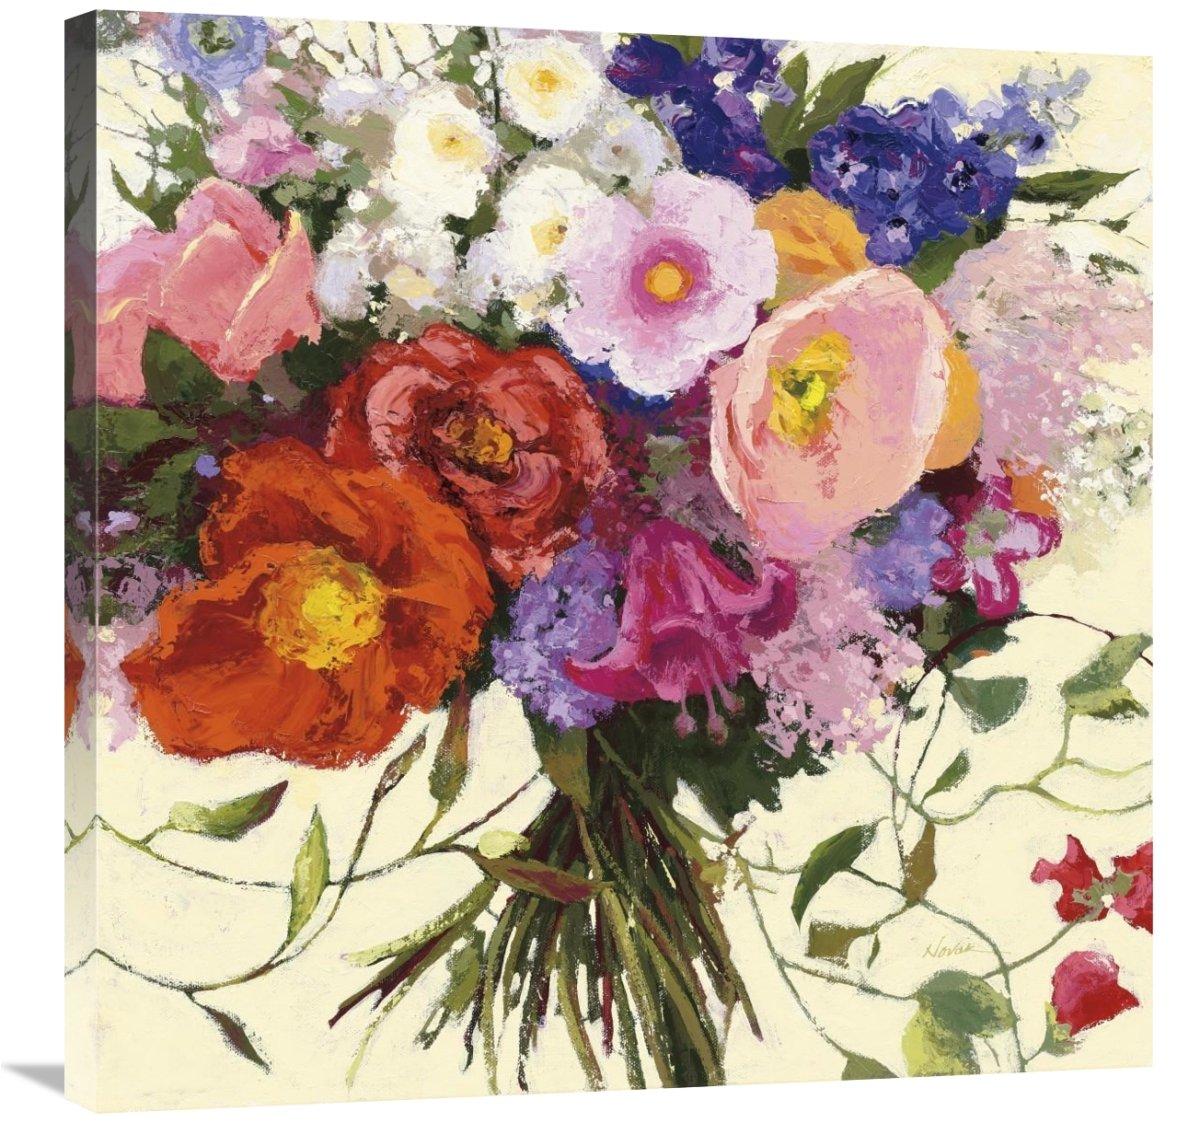 Global Gallery Shirley Novak Bouquet de Printemps Giclee Stretched Canvas Artwork 30 x 30